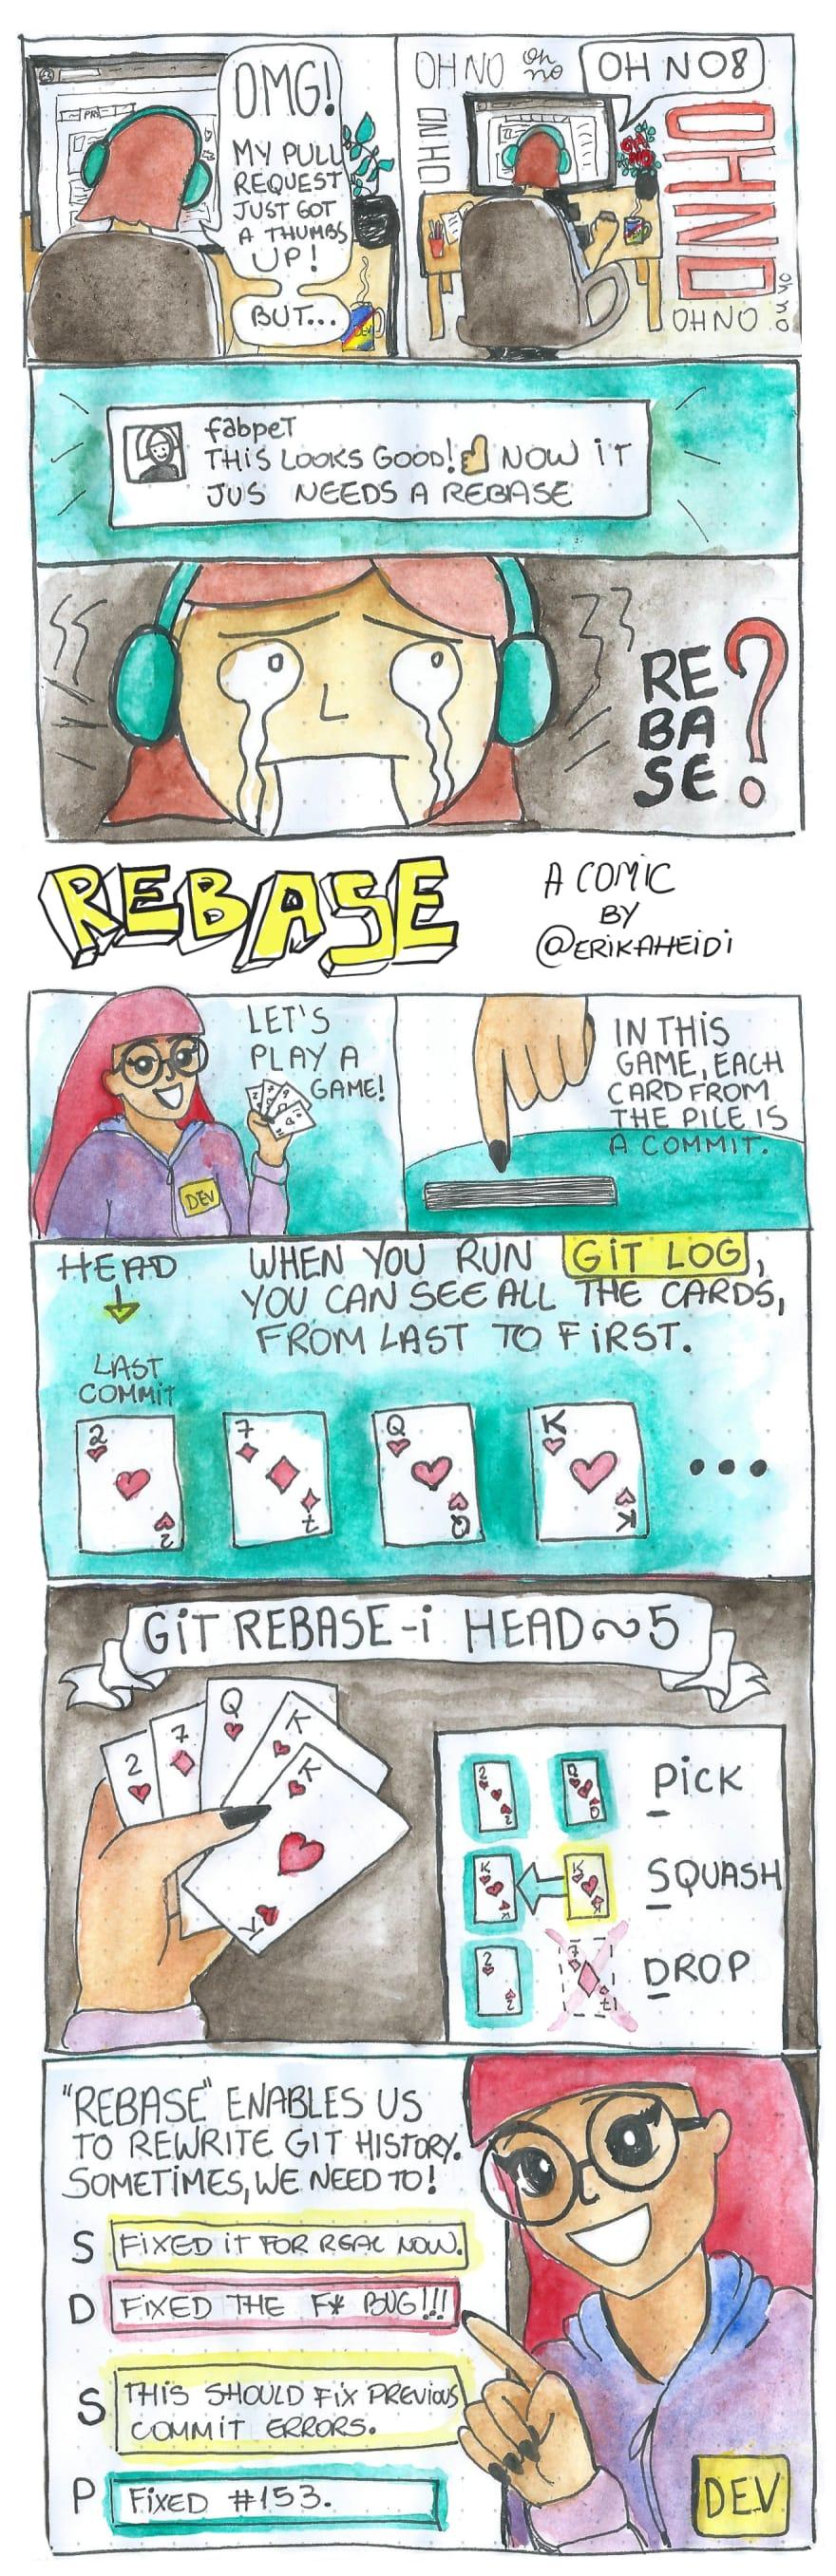 Git Rebase Comic